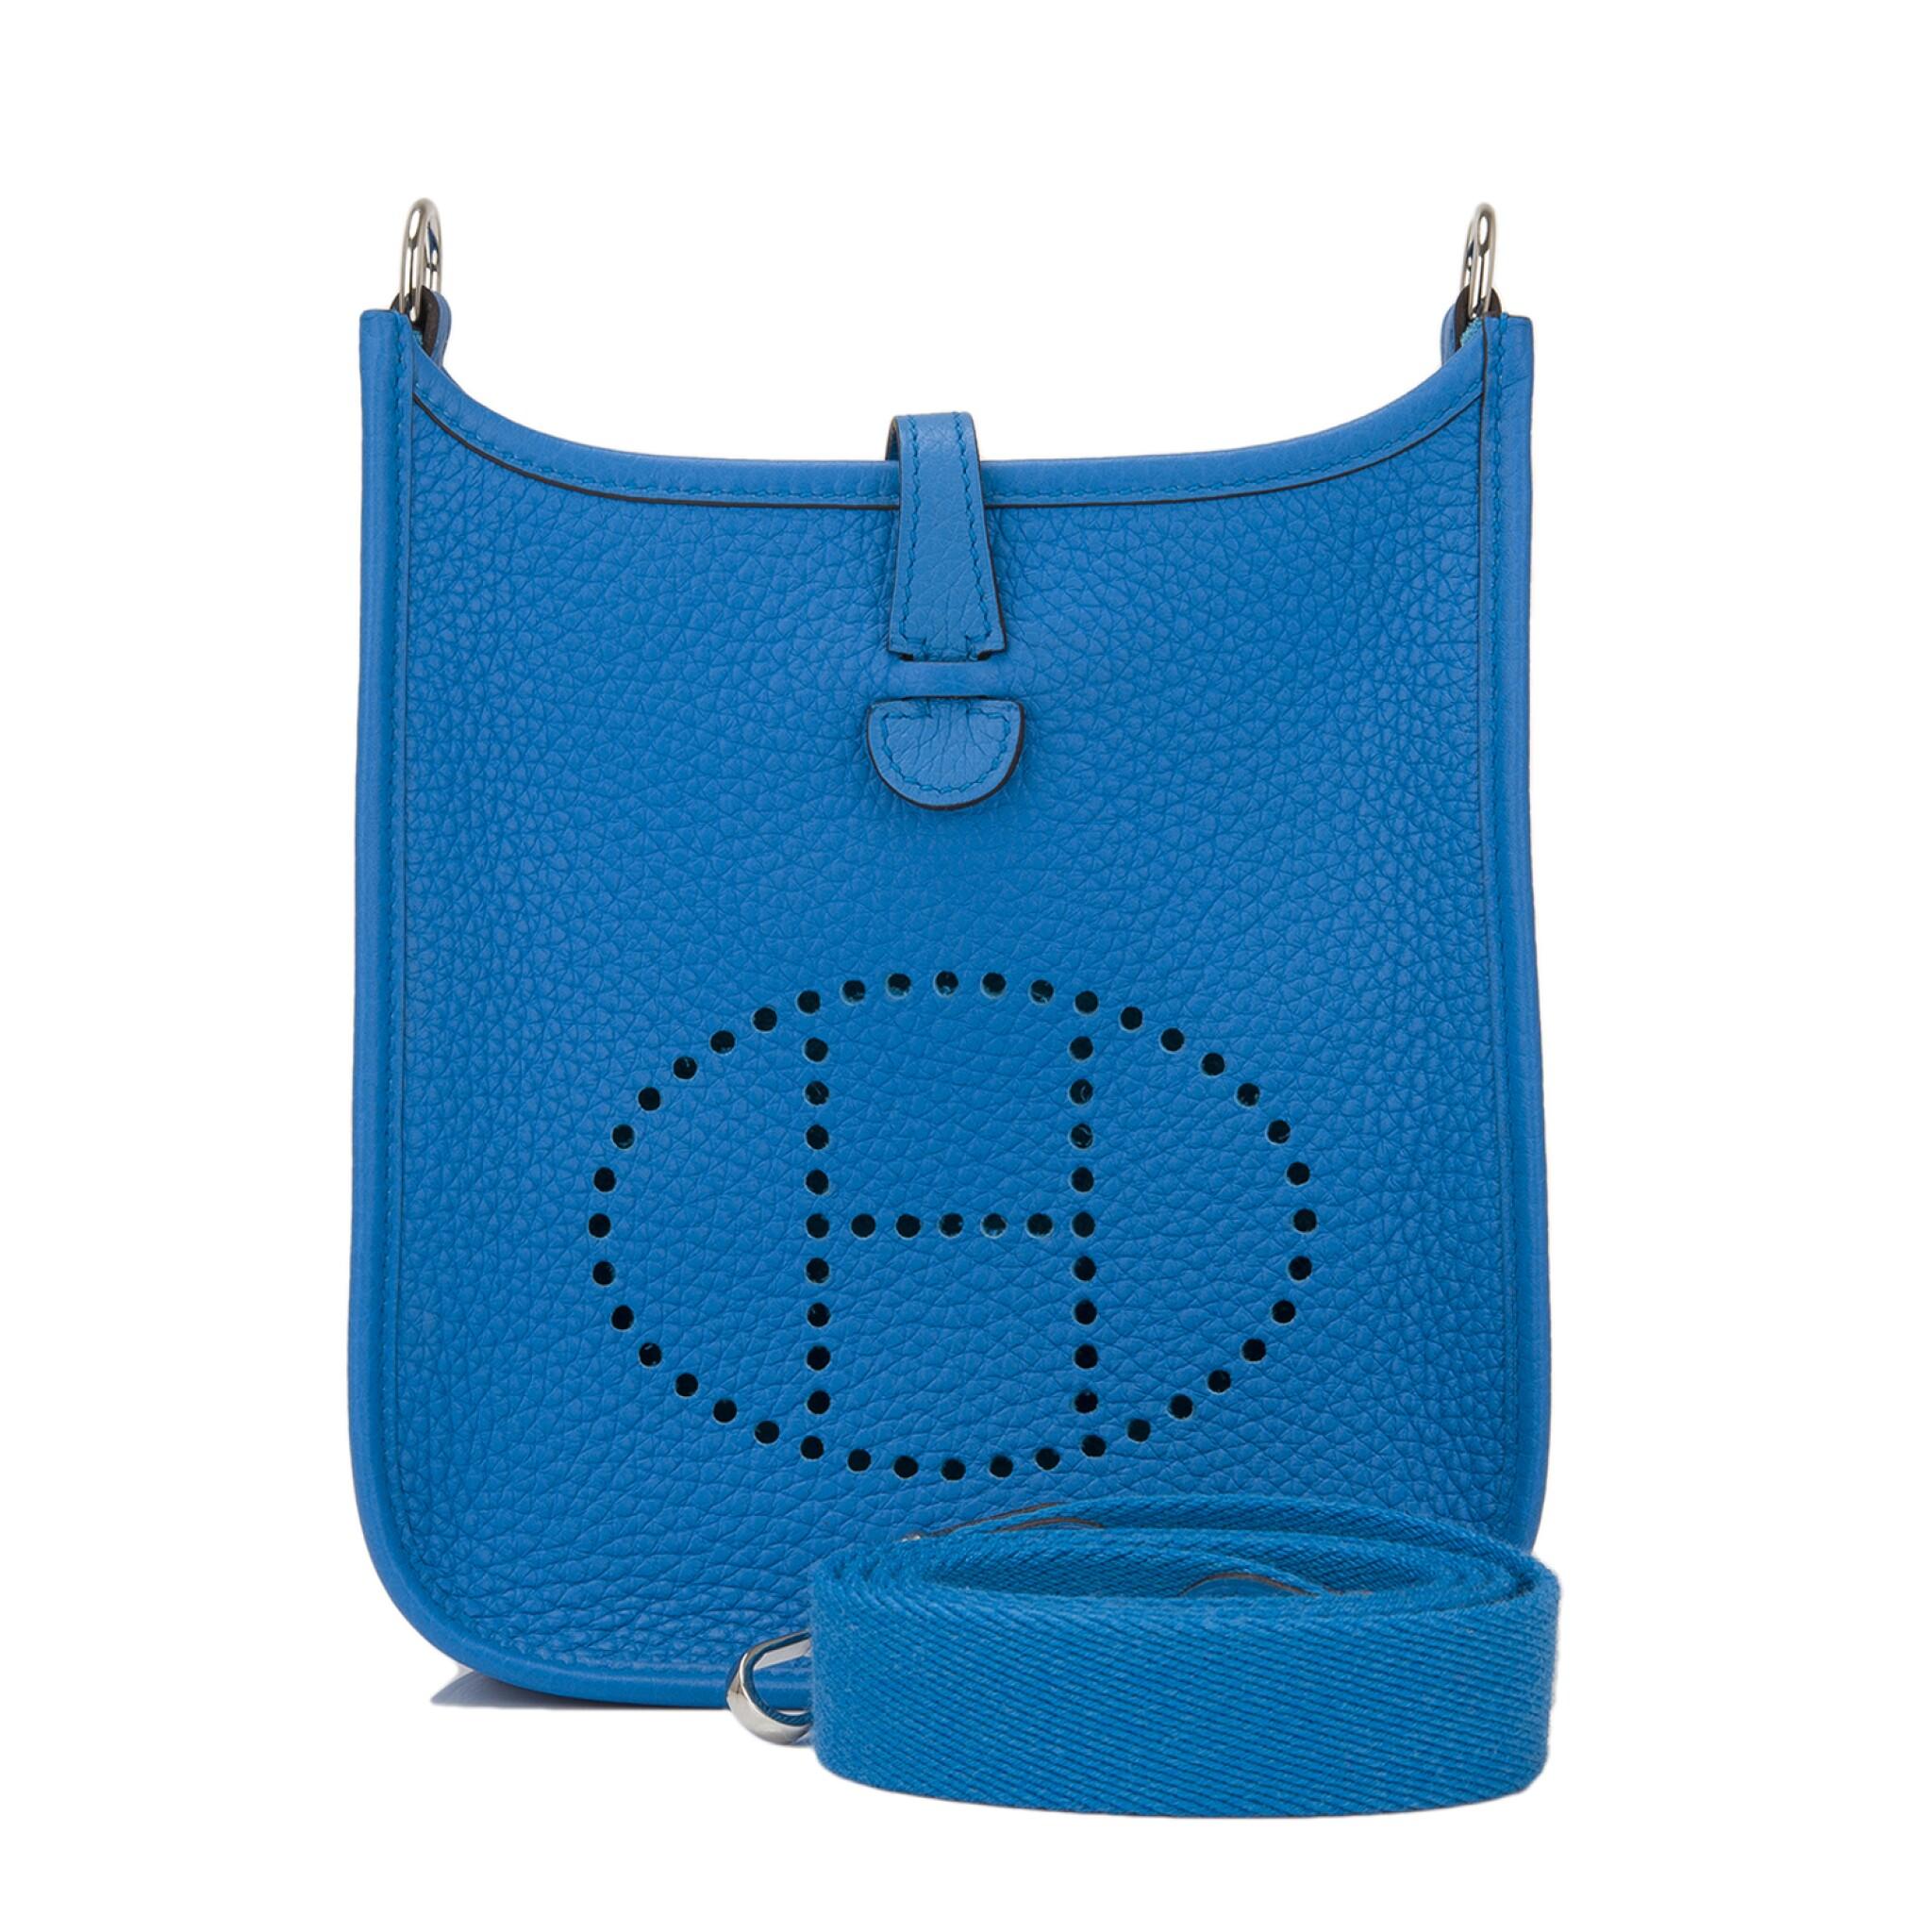 View full screen - View 1 of Lot 17. Hermès Bleu Zanizbar Evelyne TPM of Clemence Leather with Palladium Hardware.